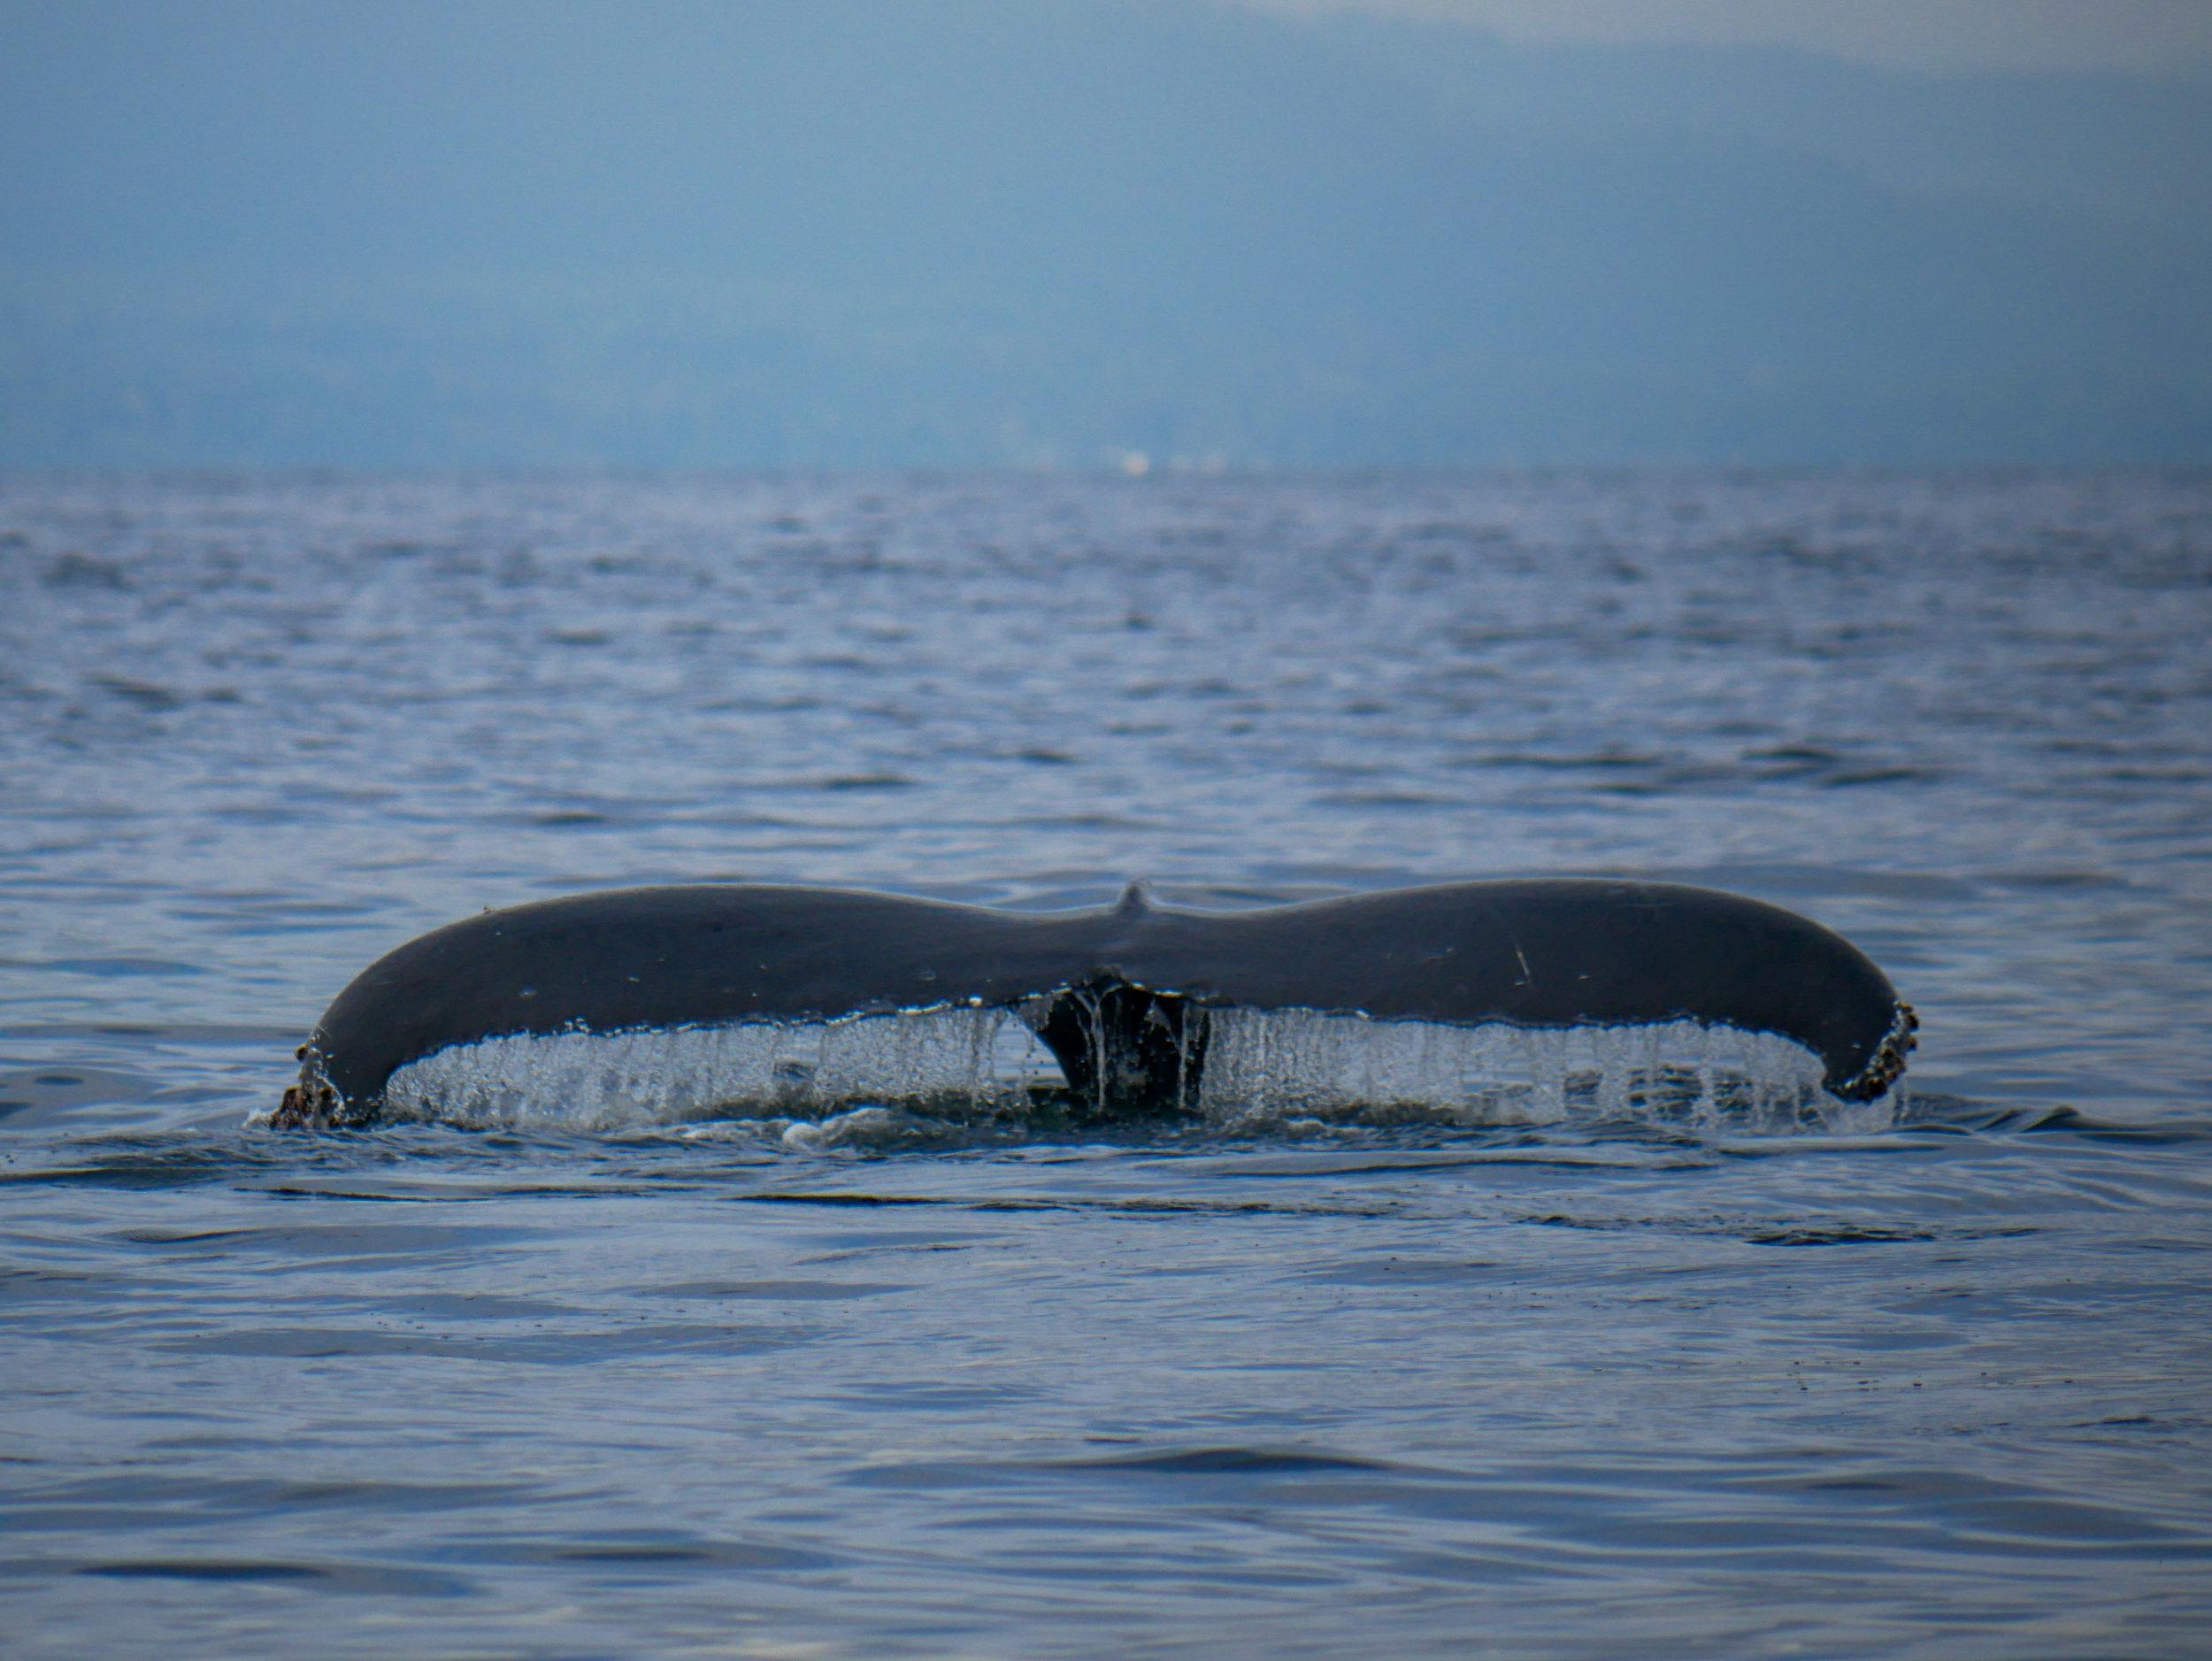 Trailing edge of a humpback fluke. Photo by Alanna Vivani - 10:30 tour.